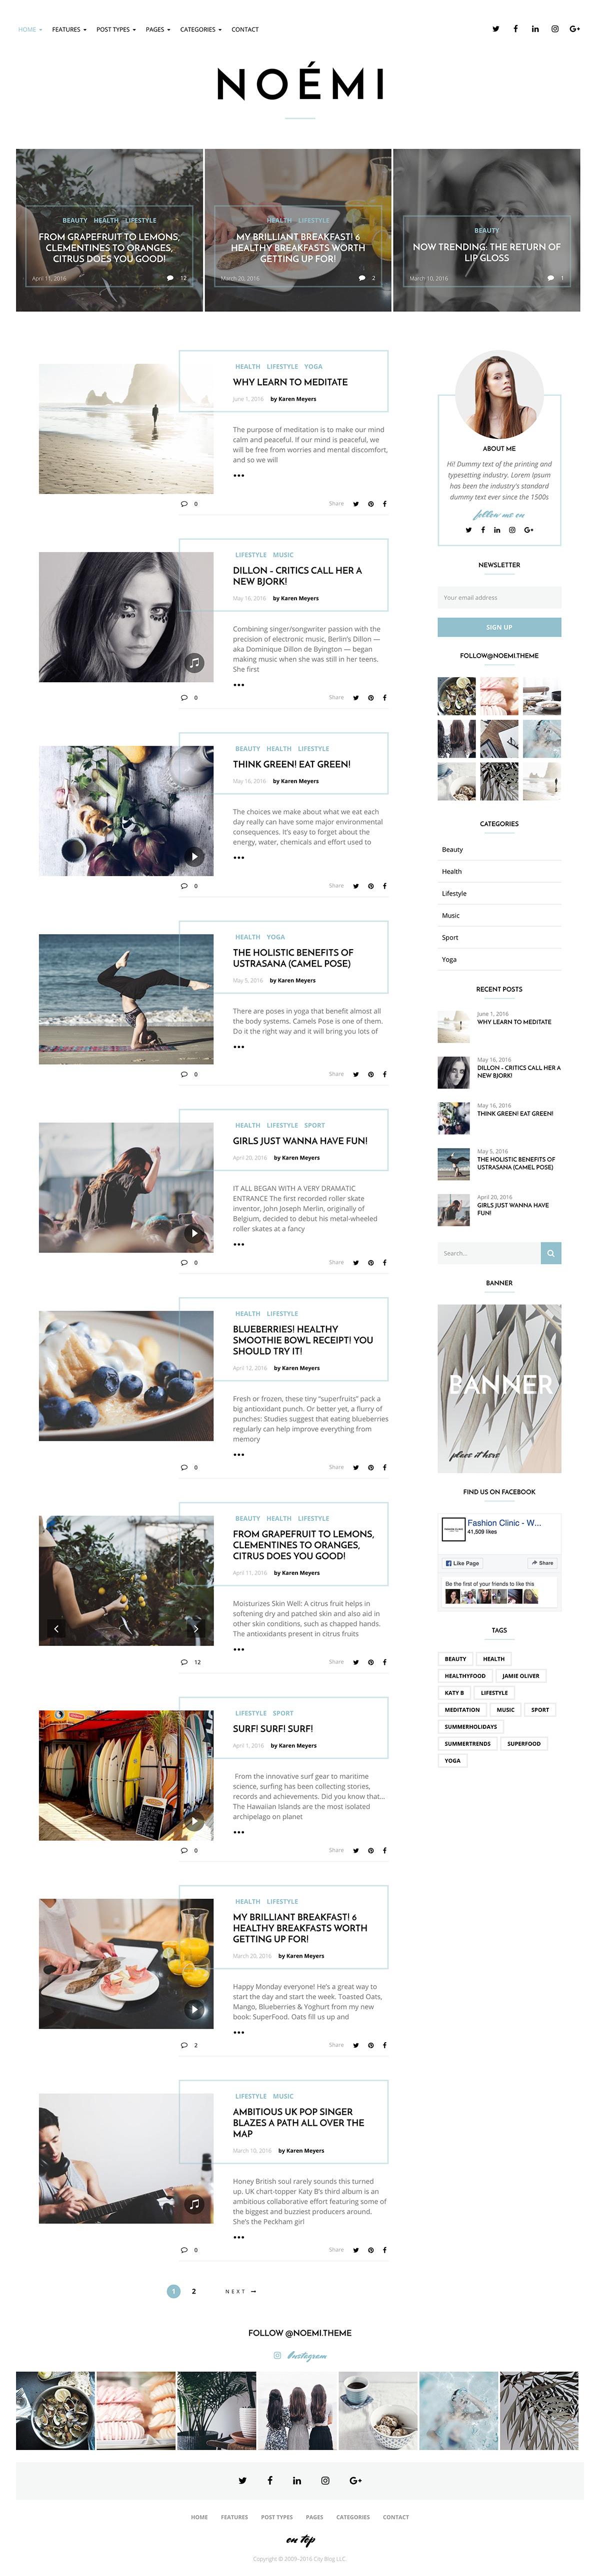 Noemi - Lifestyle Blog Theme